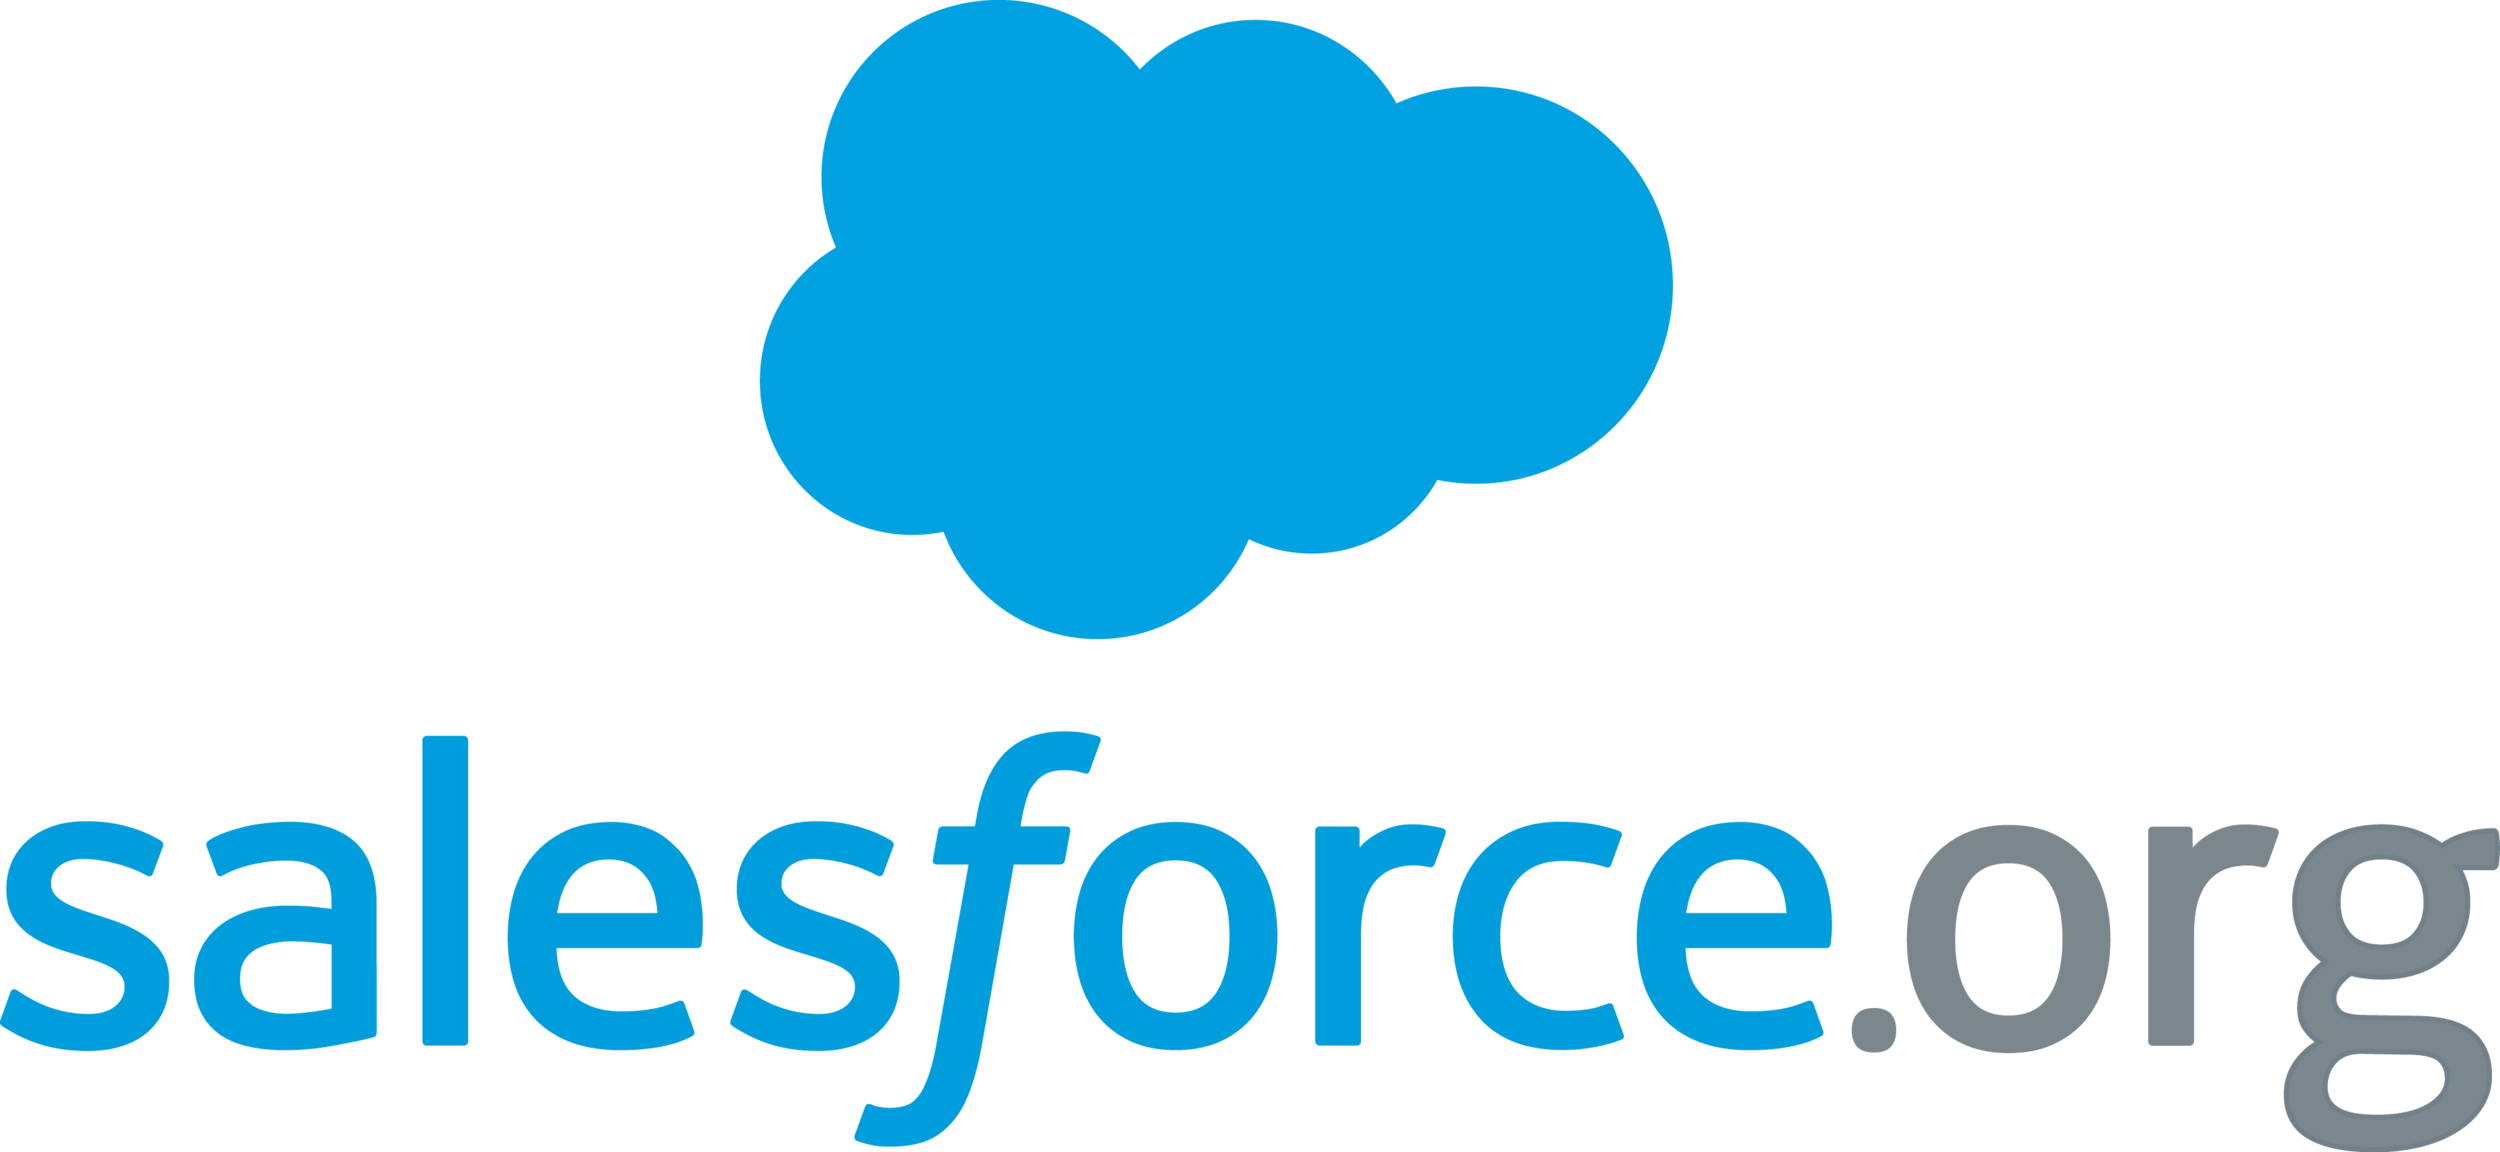 salesforce dot org-logo-vert-gray.png